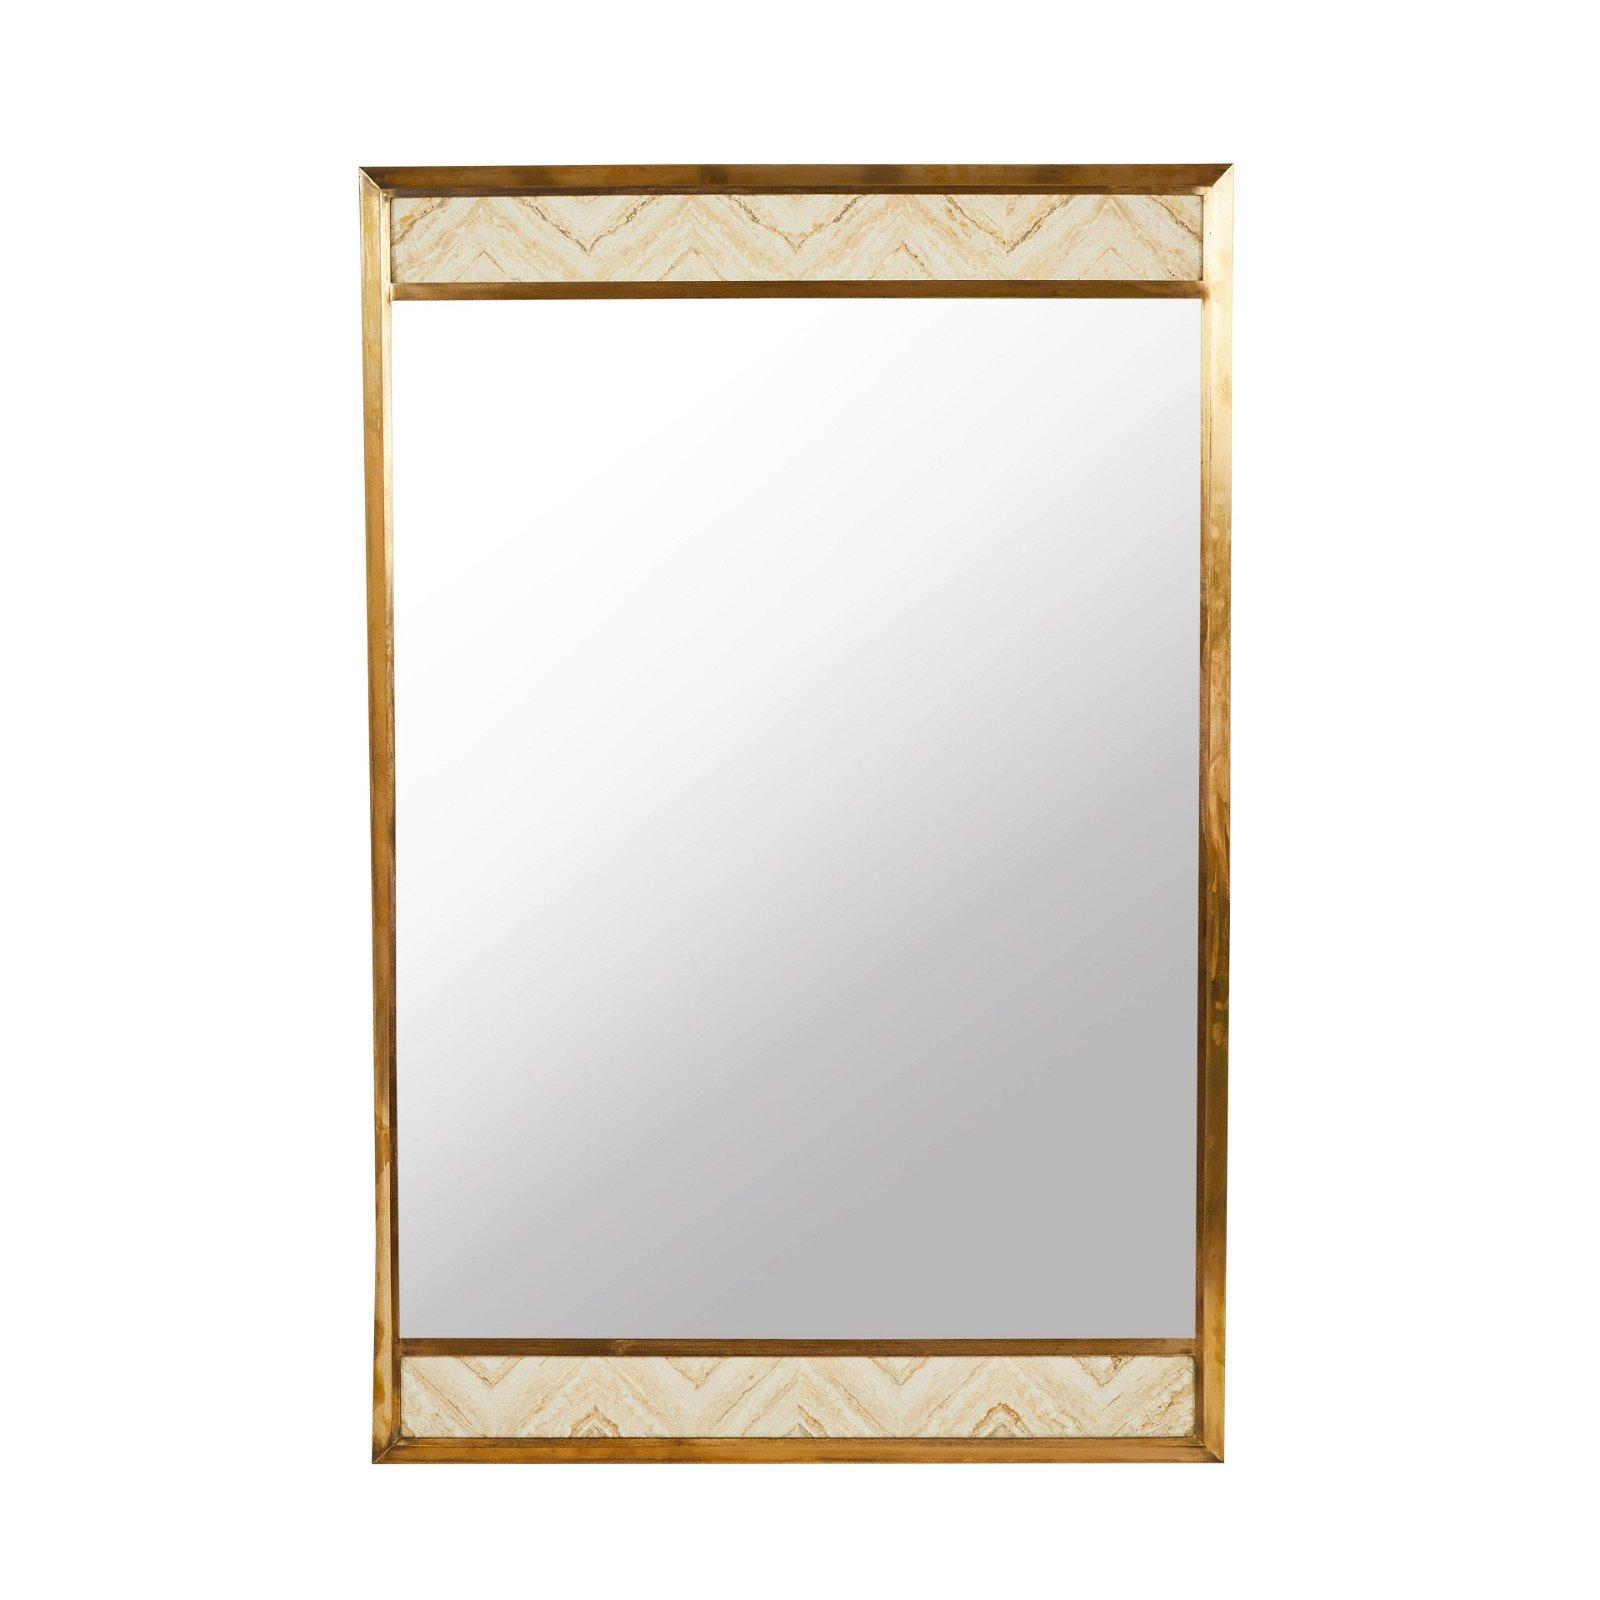 Brass and Travertine Wall Mirror